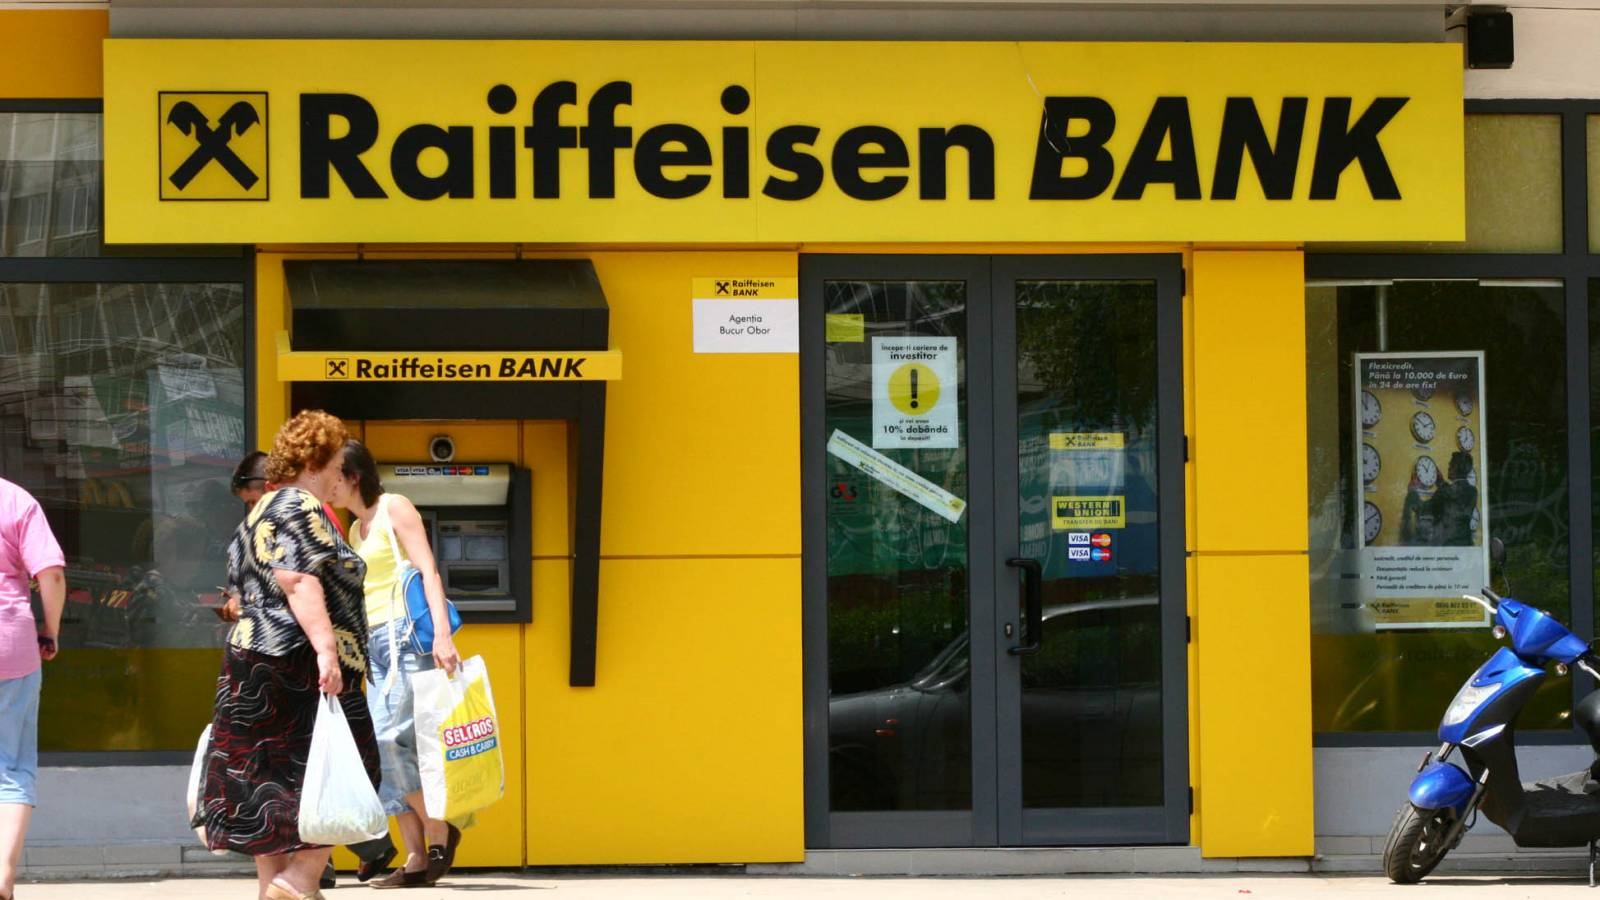 Raiffeisen Bank solicitari